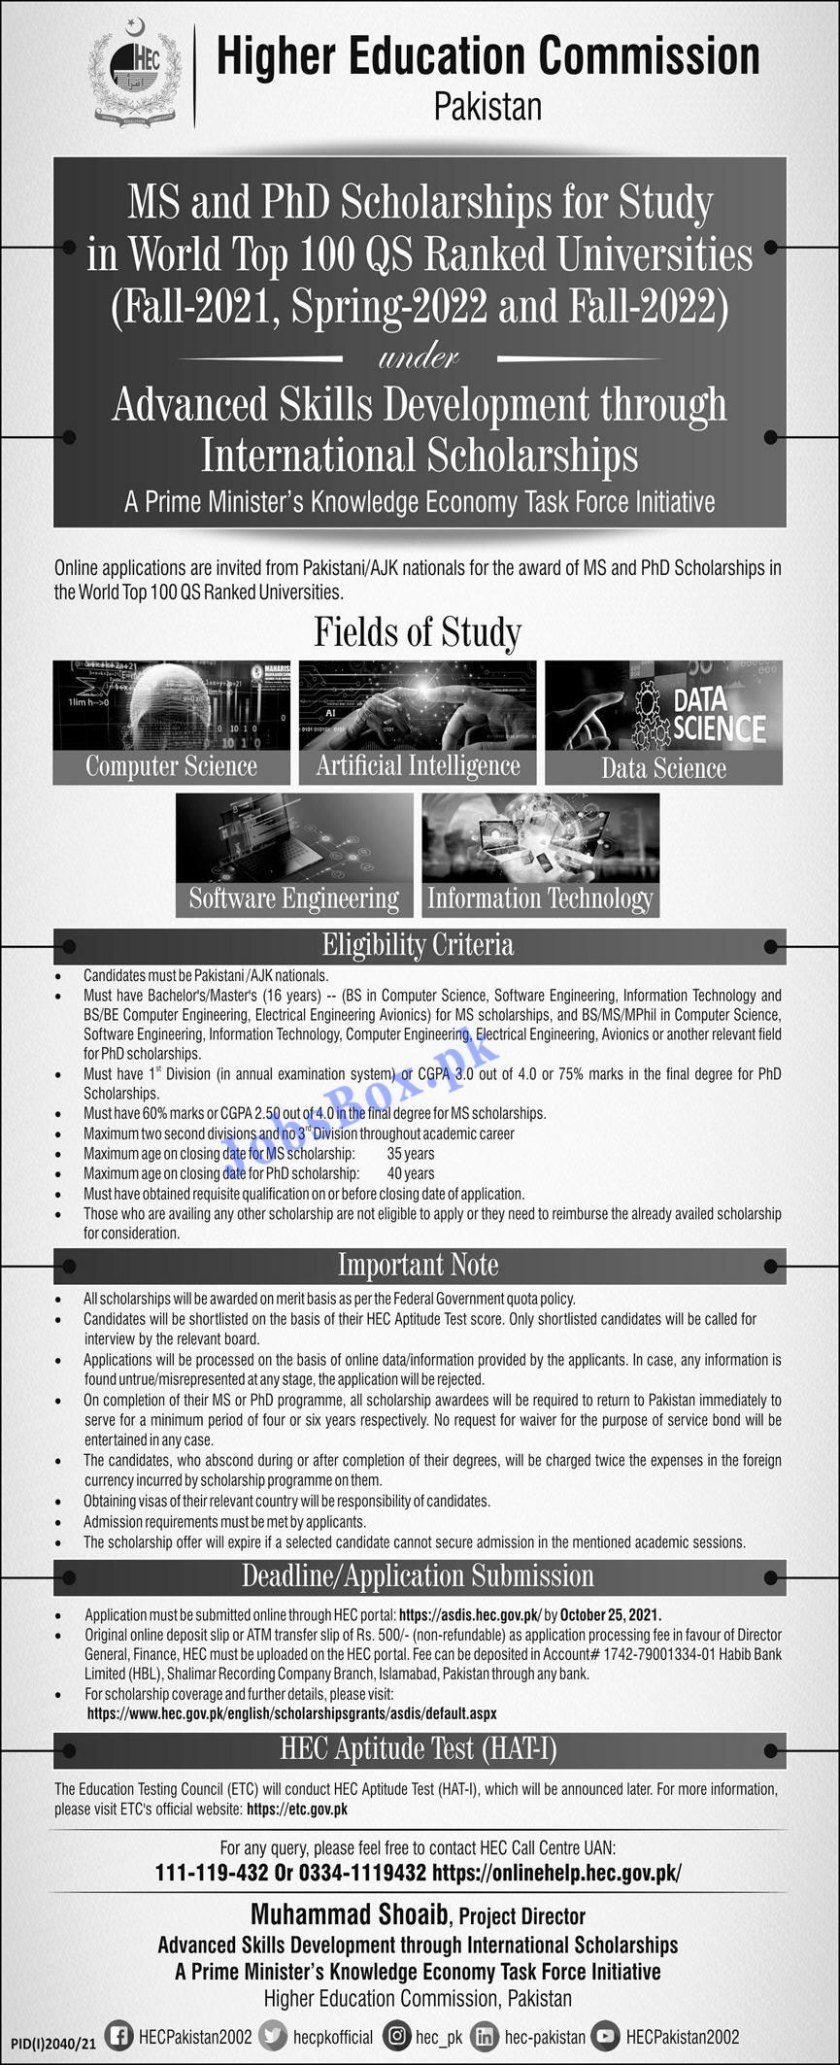 HEC MS and PhD Scholarship Program 2021 - Eportal.hec.gov.pk